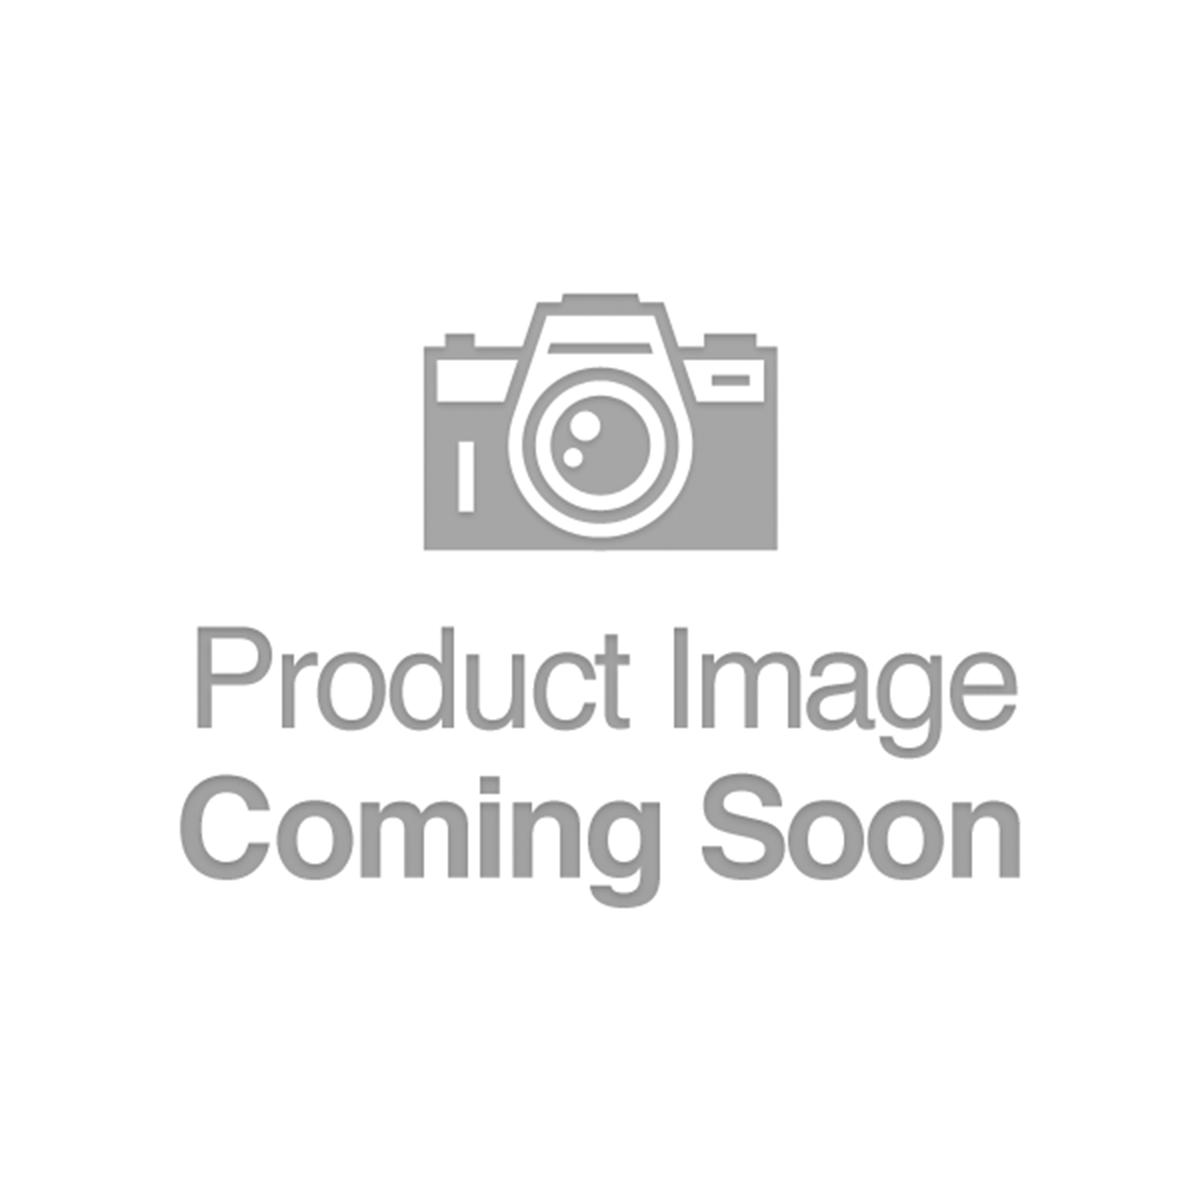 Wytheville - Virginia - CH 9012 - FR 1802-1 - PMG 30